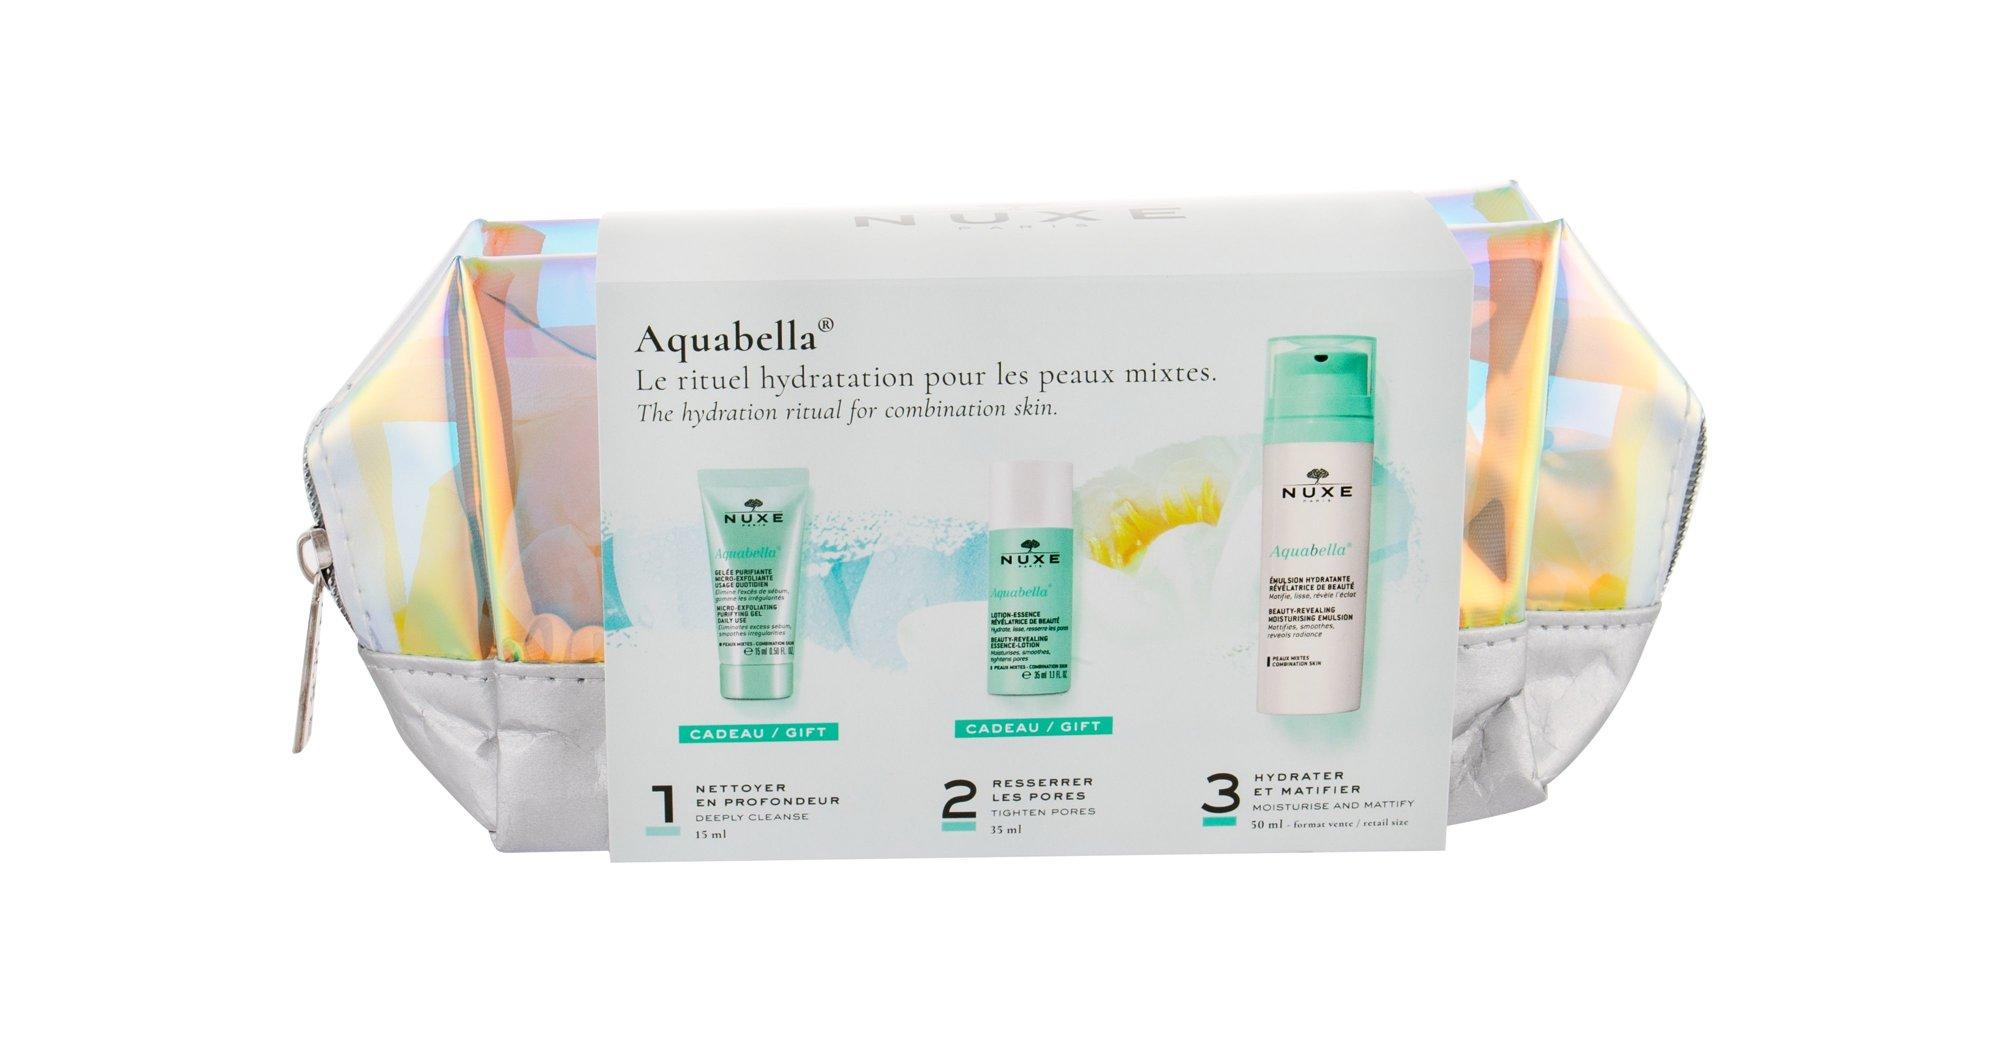 NUXE Aquabella Facial Gel 50ml